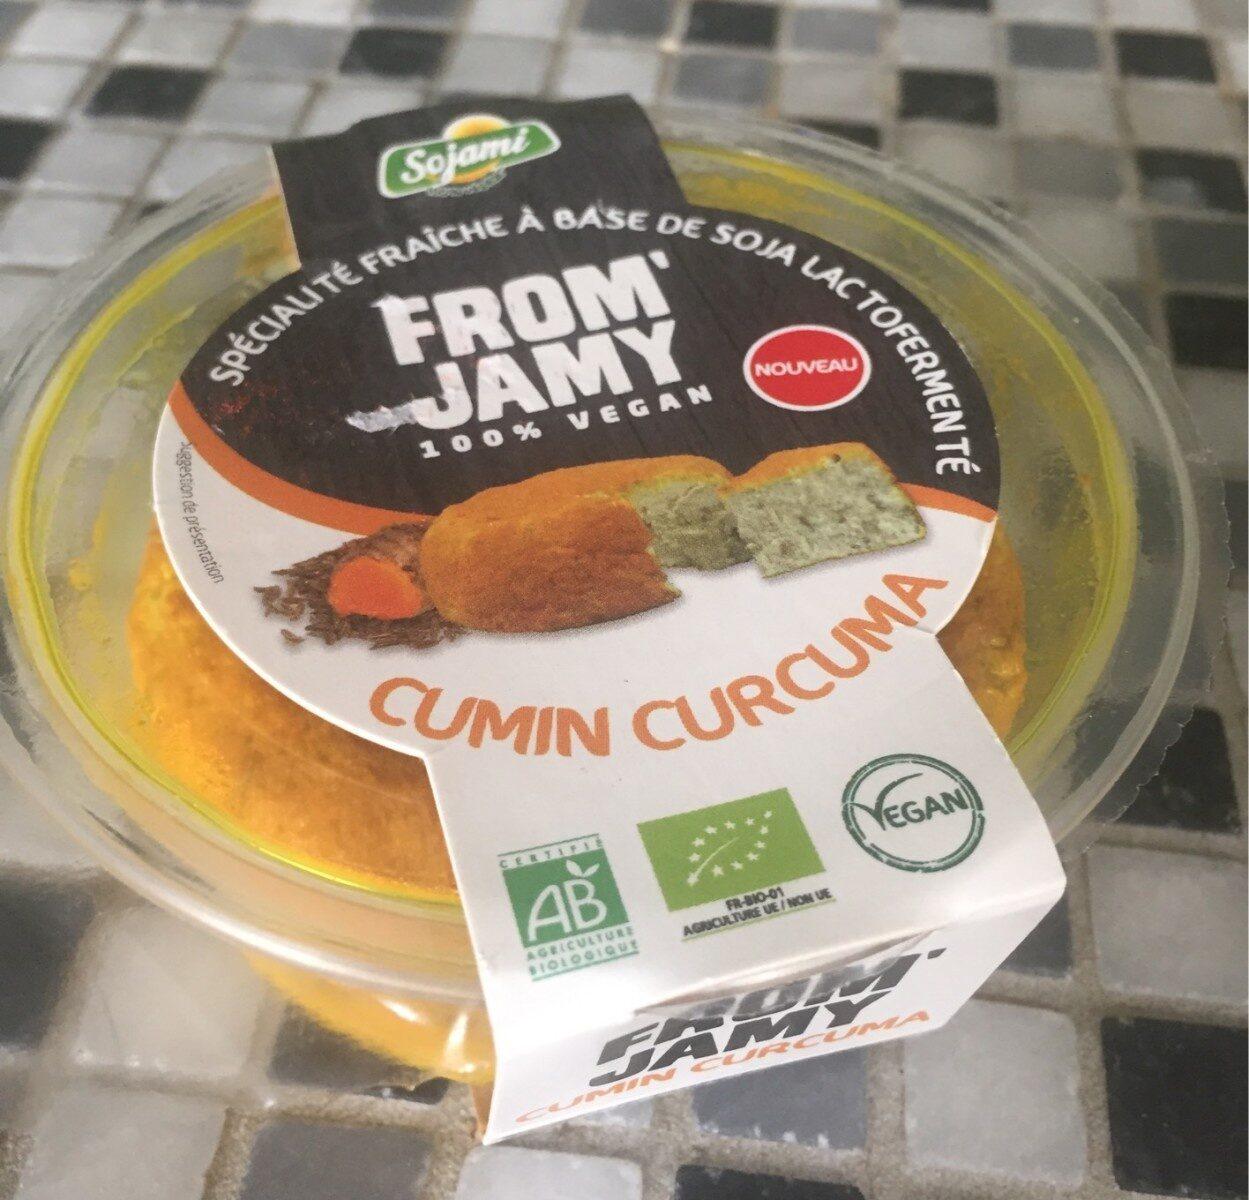 From Jamy Cumin curcuma - Product